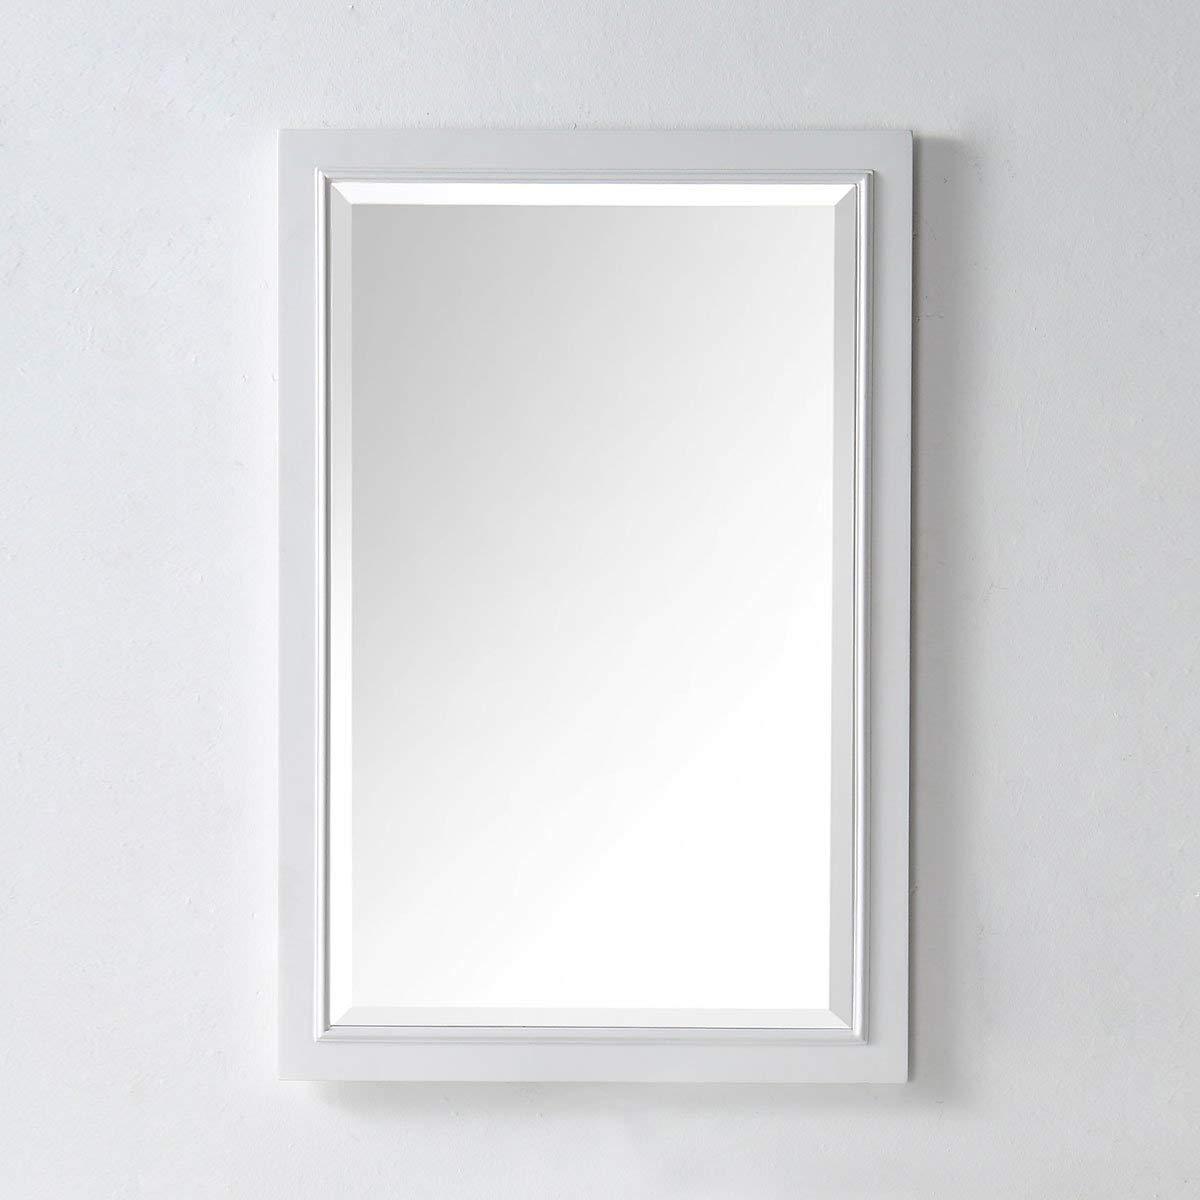 Cheap 24x36 Frame White Find 24x36 Frame White Deals On Line At